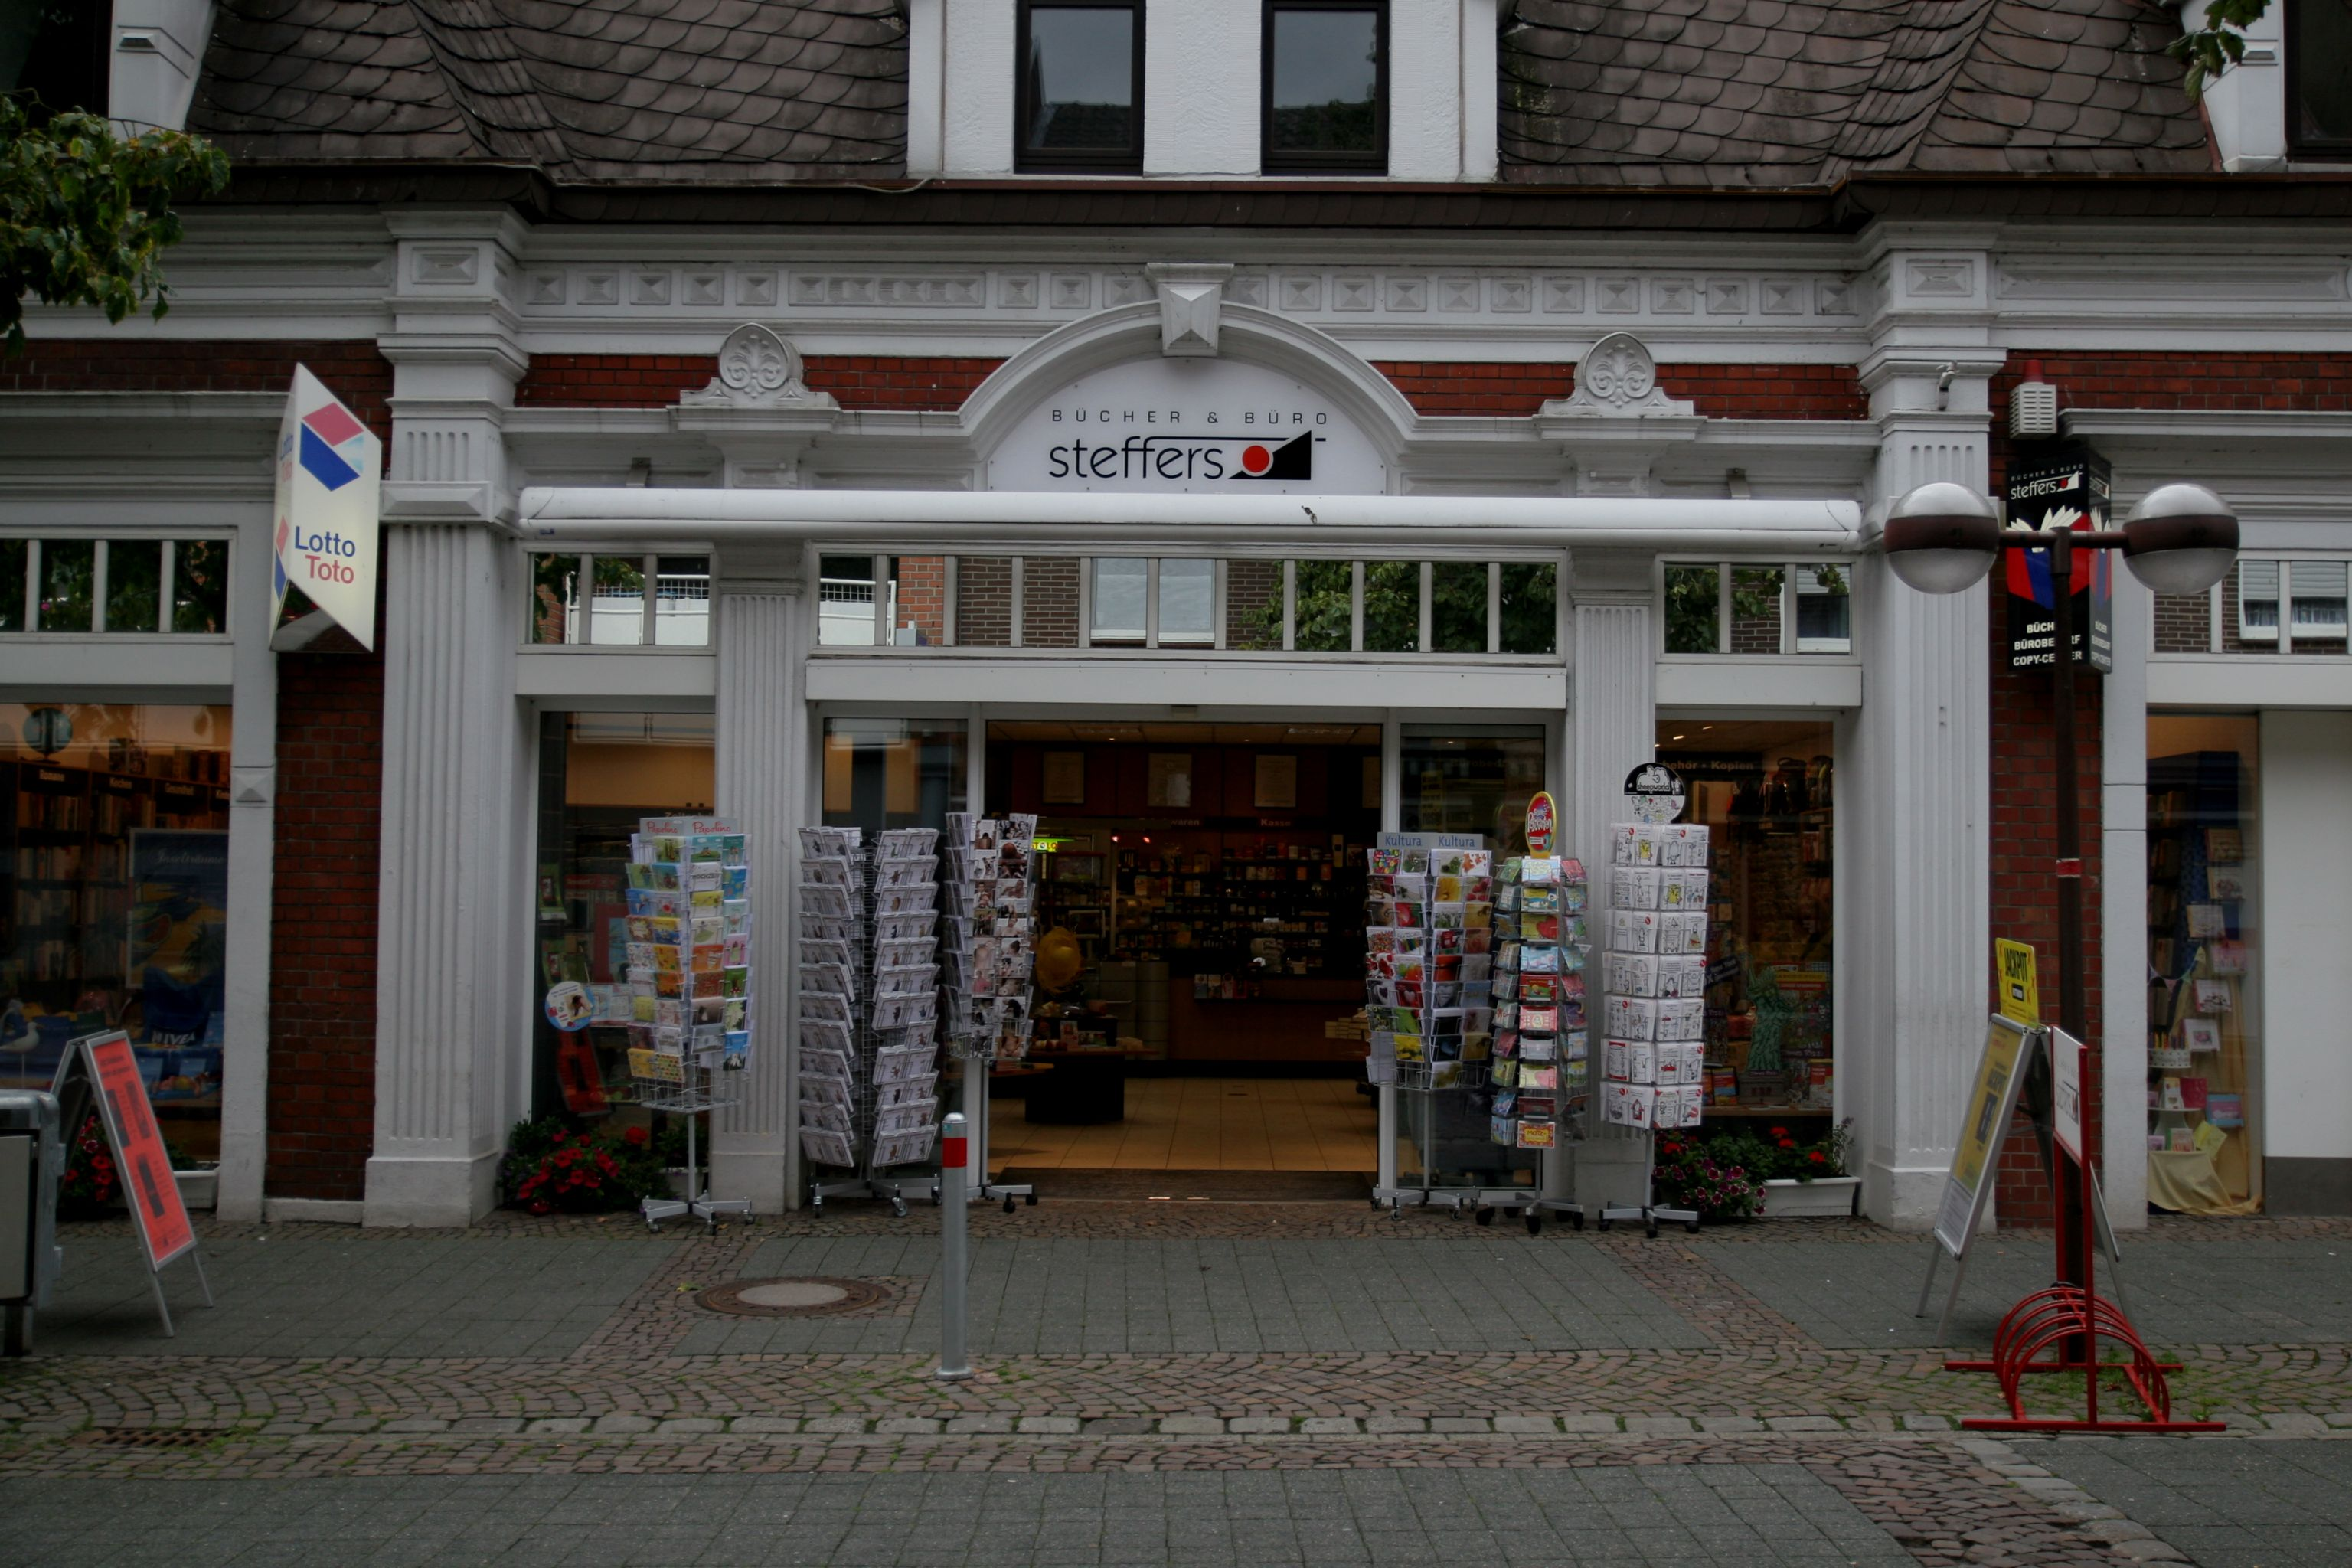 Steffers Bücher & Büro